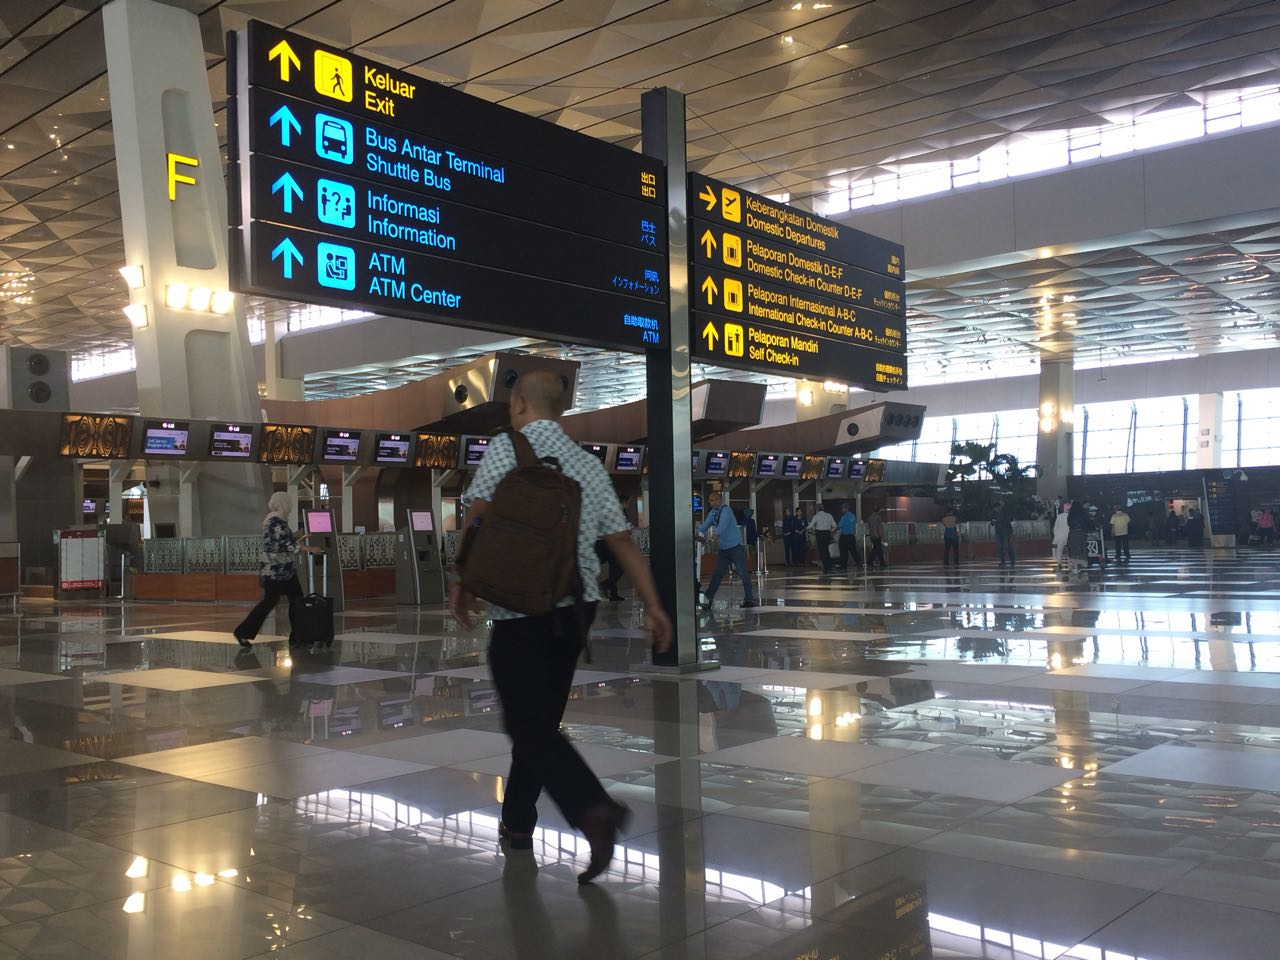 https: img-z.okeinfo.net content 2019 06 15 320 2066857 ada-bandara-yang-rugi-rp13-miliar-karena-tiket-pesawat-mahal-jaUWylwQZ6.jpg